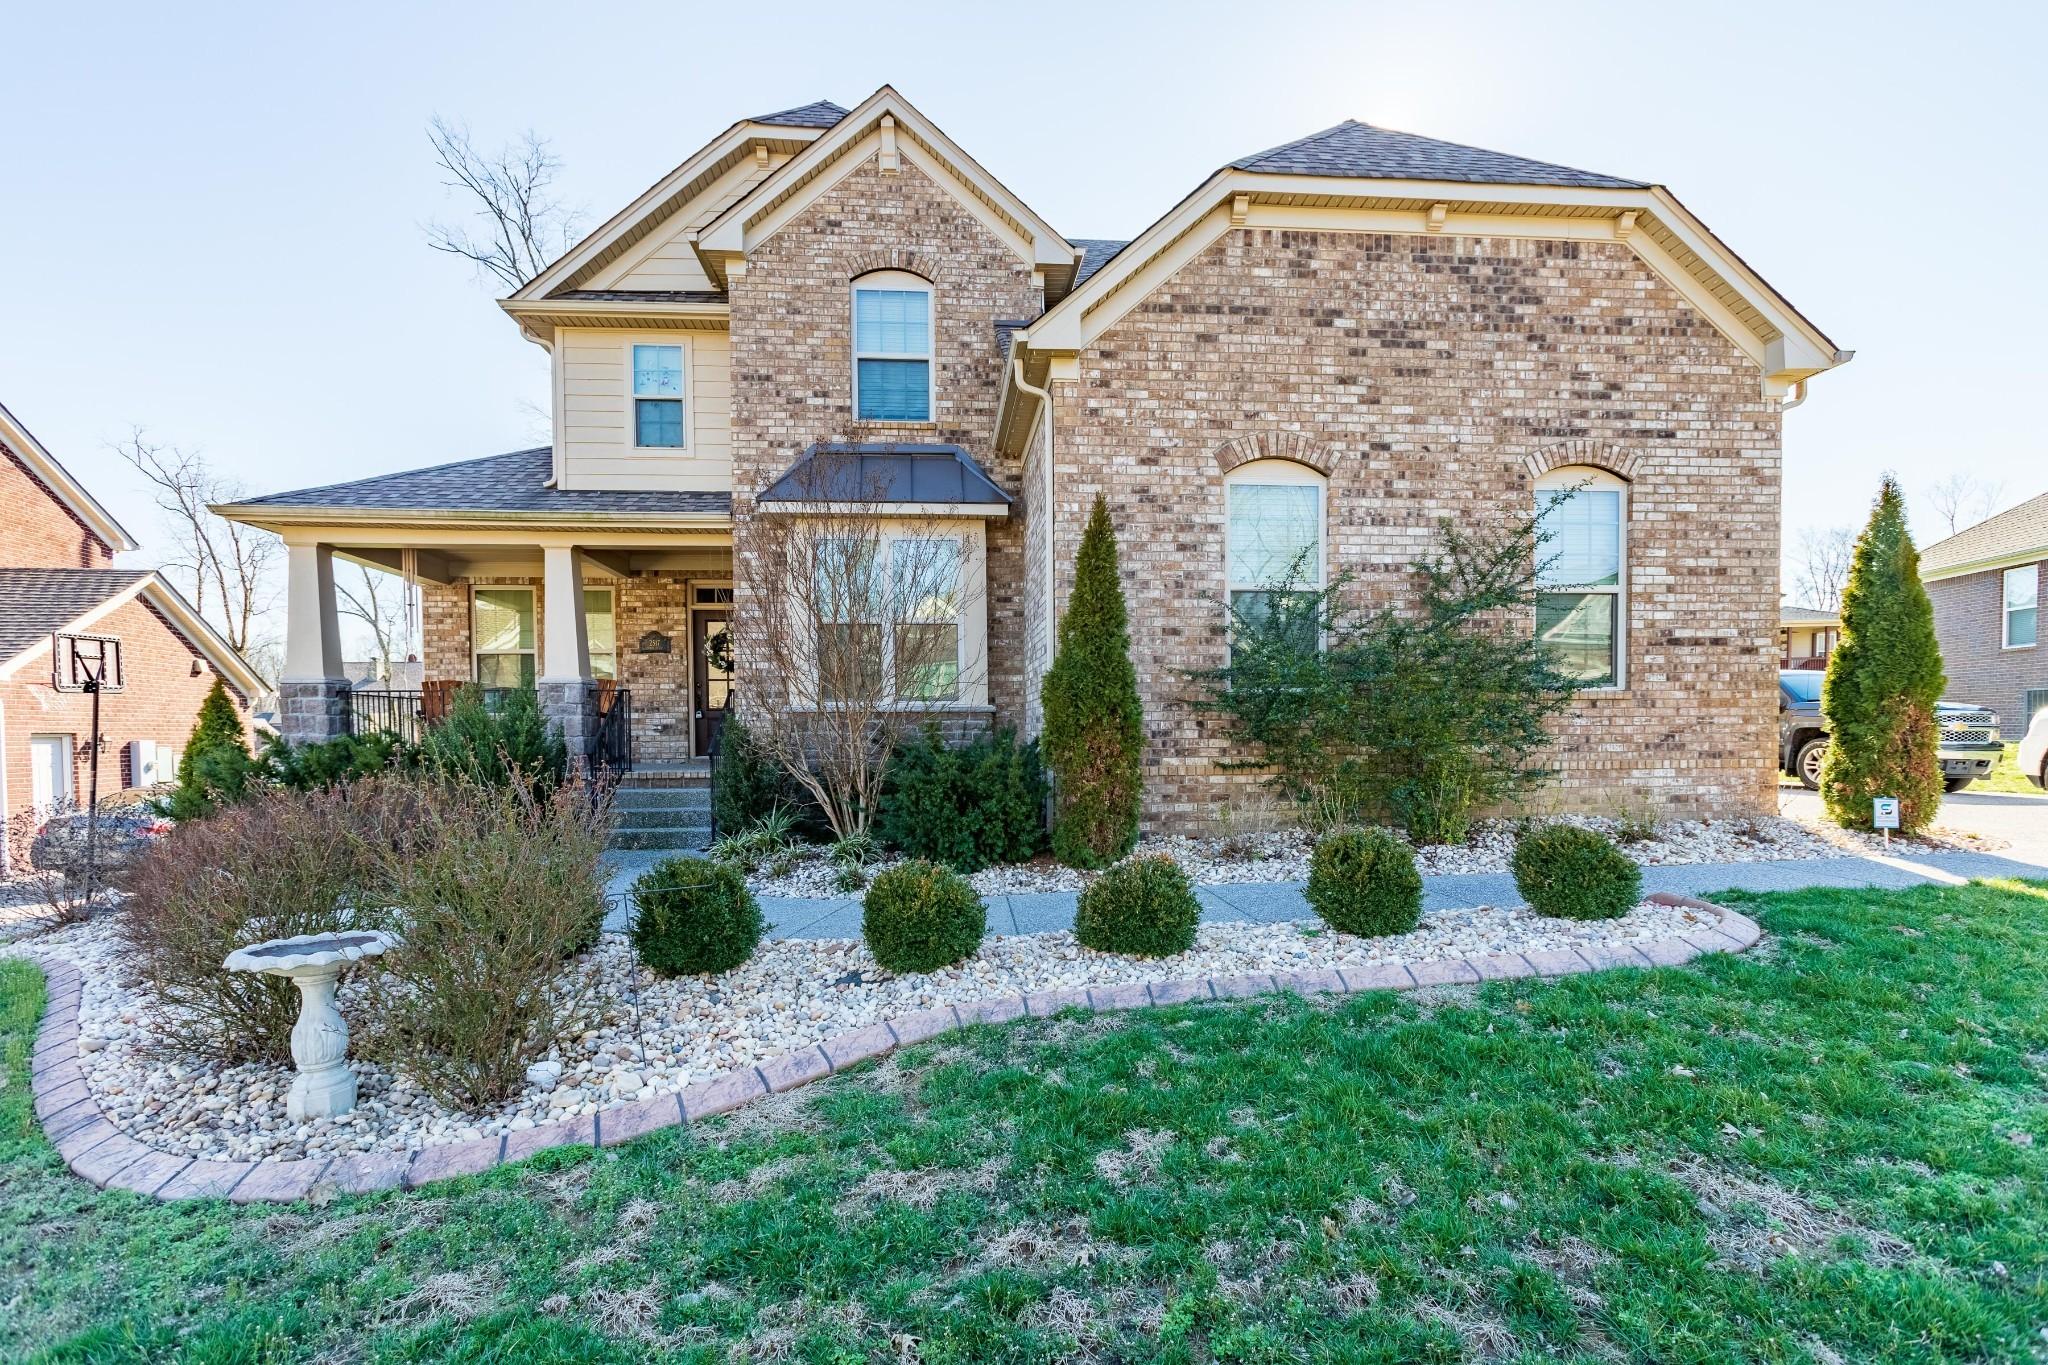 2517 Arbor Pointe Cv Property Photo - Hermitage, TN real estate listing